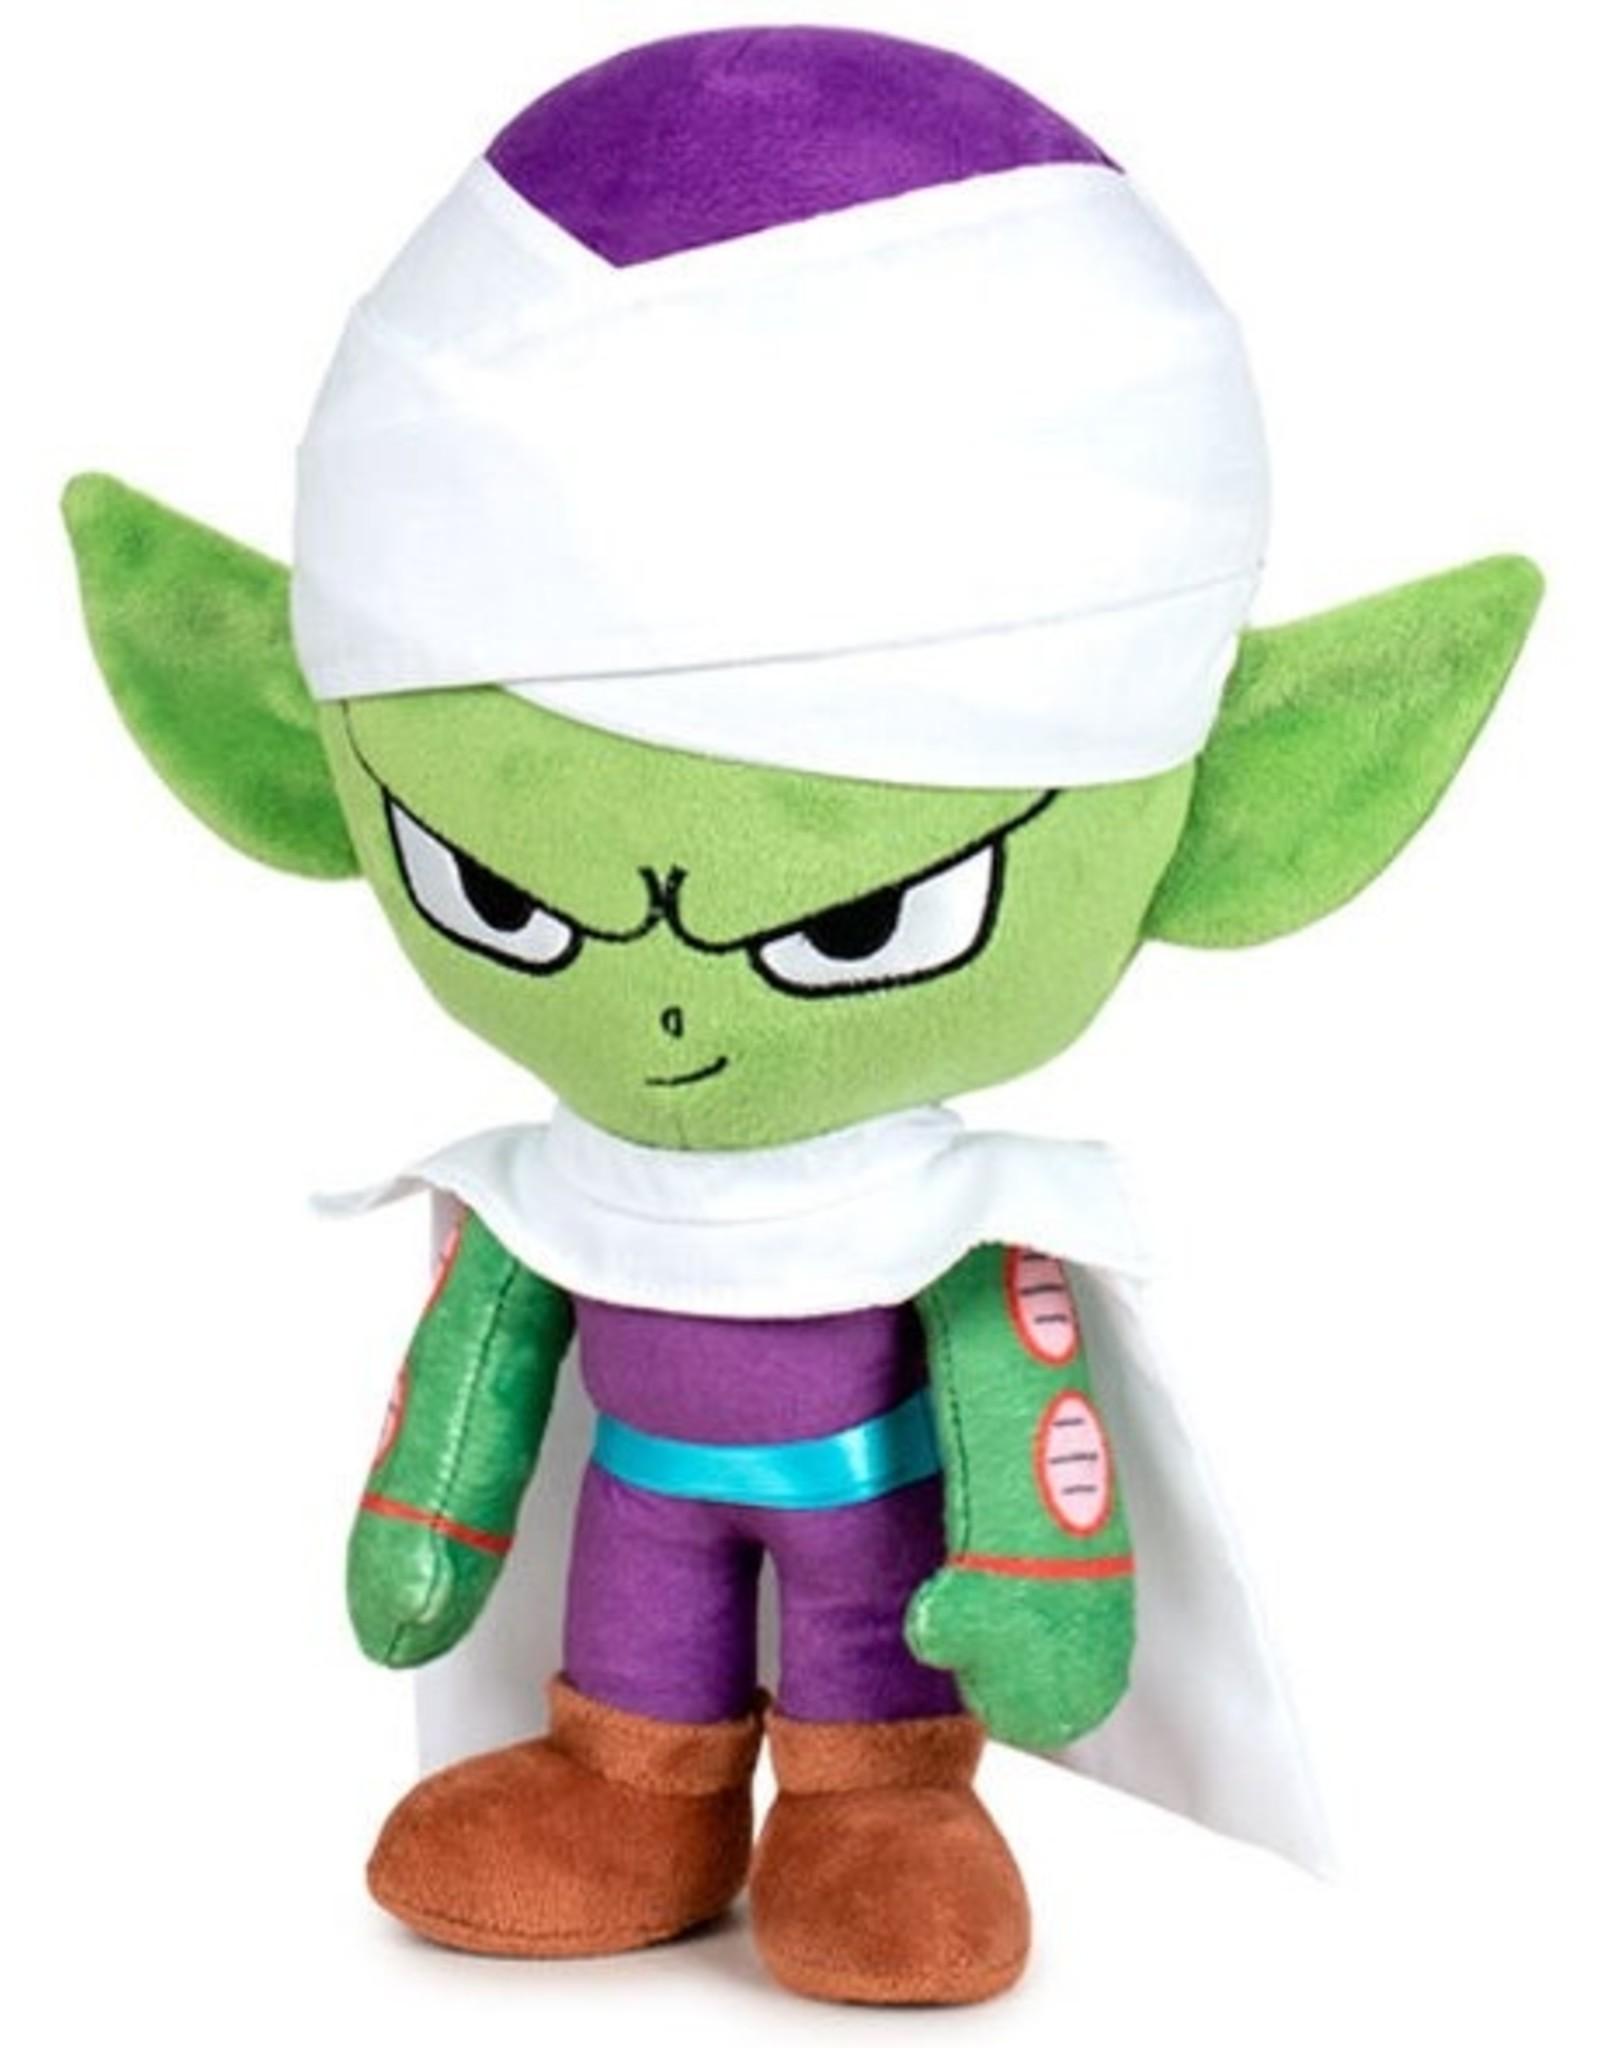 Dragon Ball Z Merchandise plush and figurines - Dragon Ball Z Piccolo plush 31cm